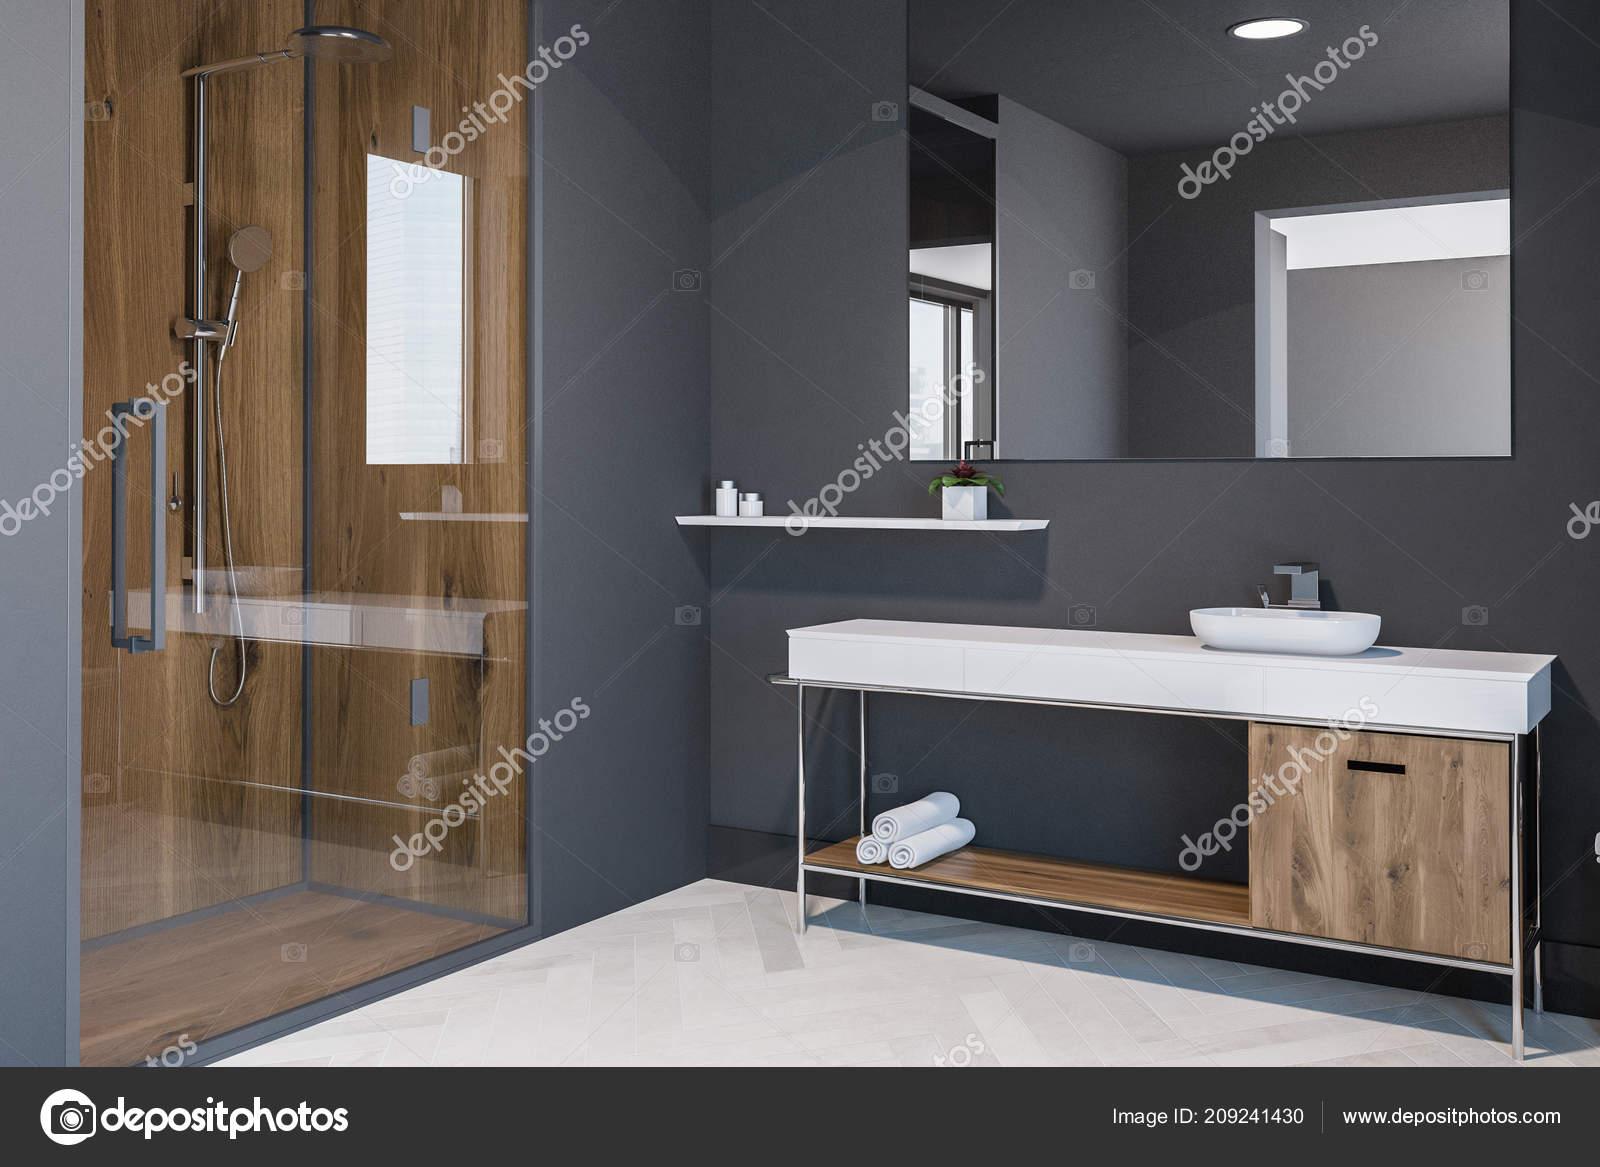 Scandinavian Style Bathroom Corner Grey Walls White Wooden Floor Sink Stock Photo Image By C Denisismagilov 209241430